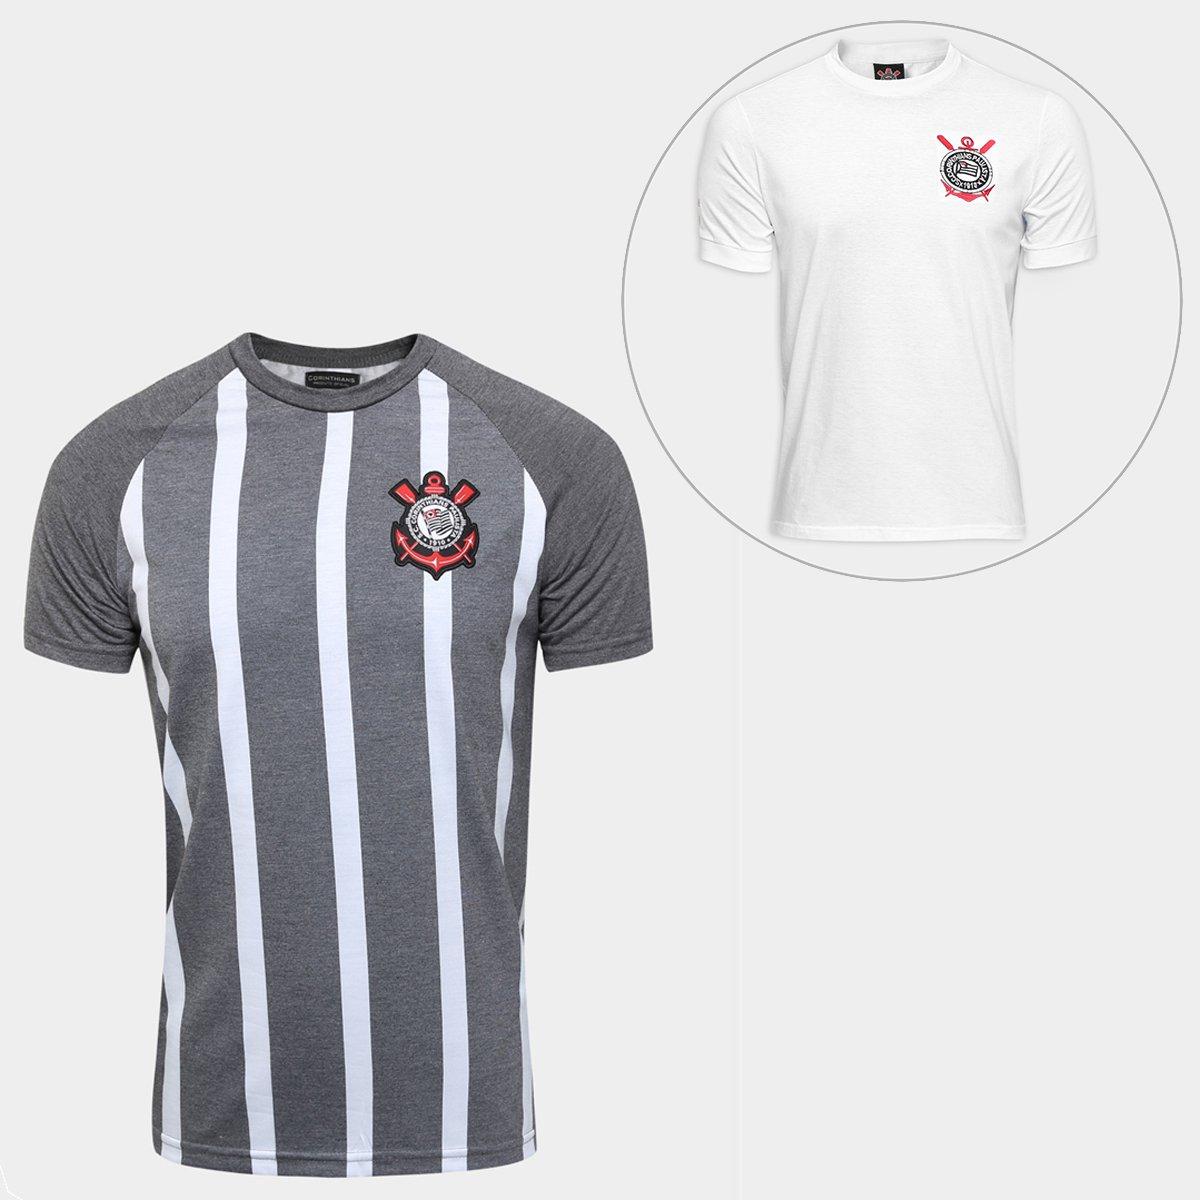 f50c572d71 Kit Camisa Corinthians Retrô + Camisa Corinthians Réplica 1979 ...